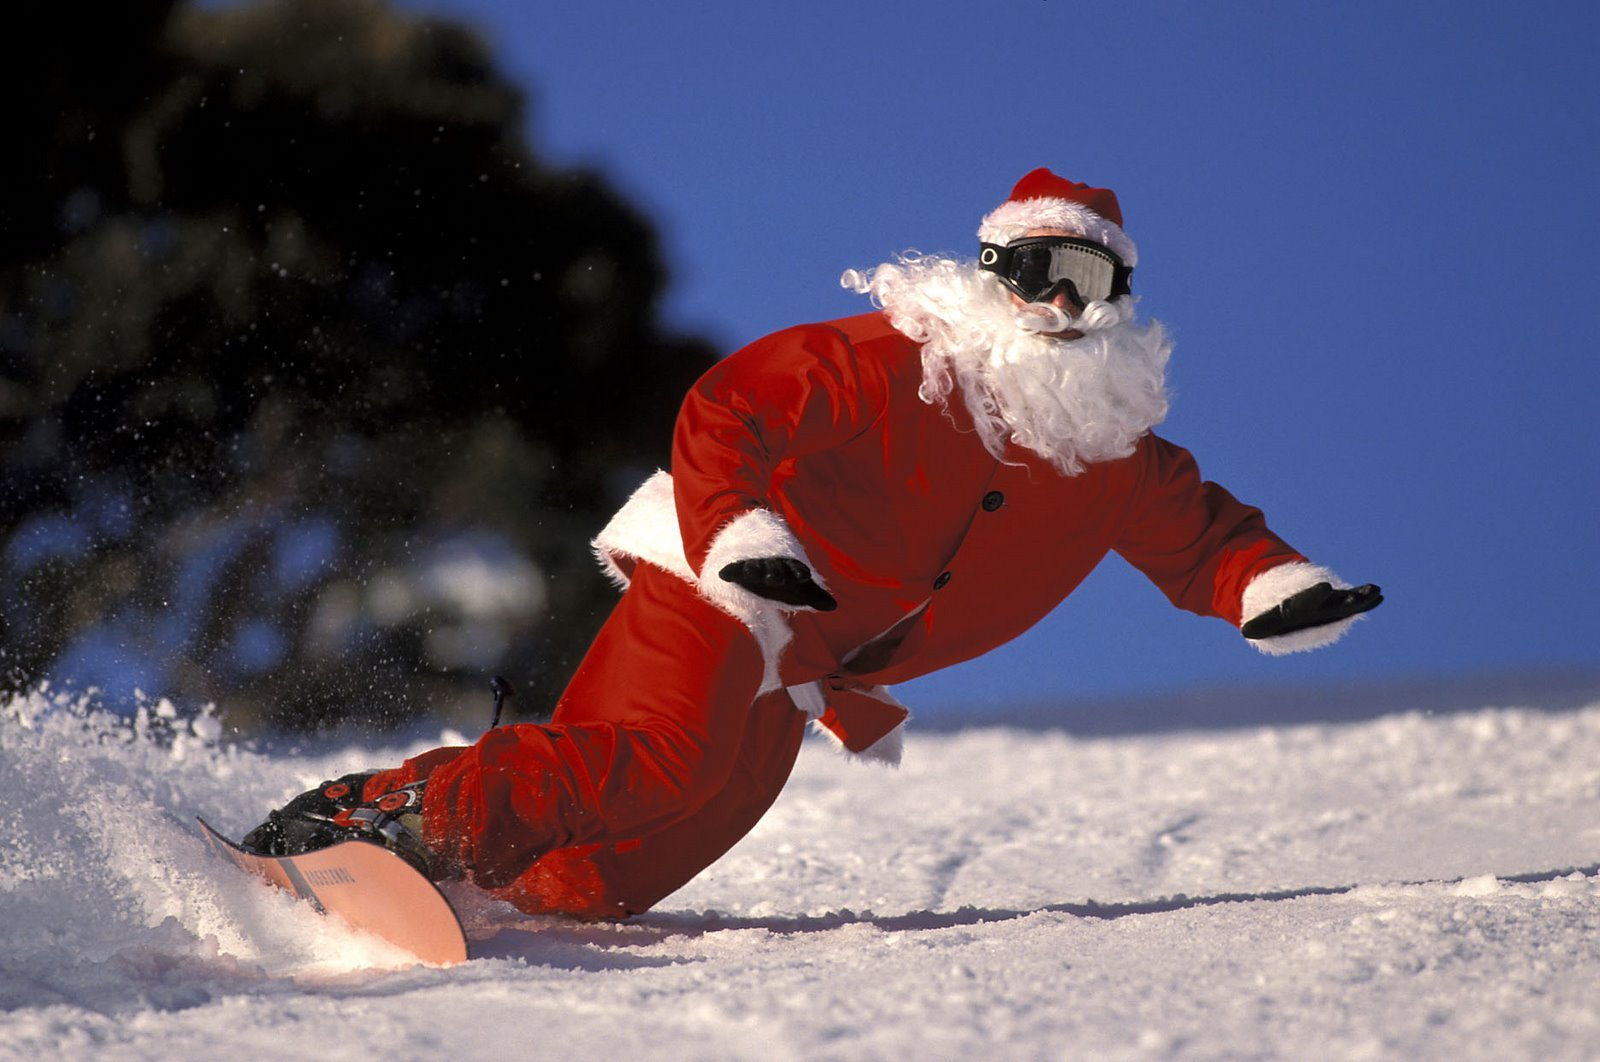 Santa snowboarding during Christmas Week